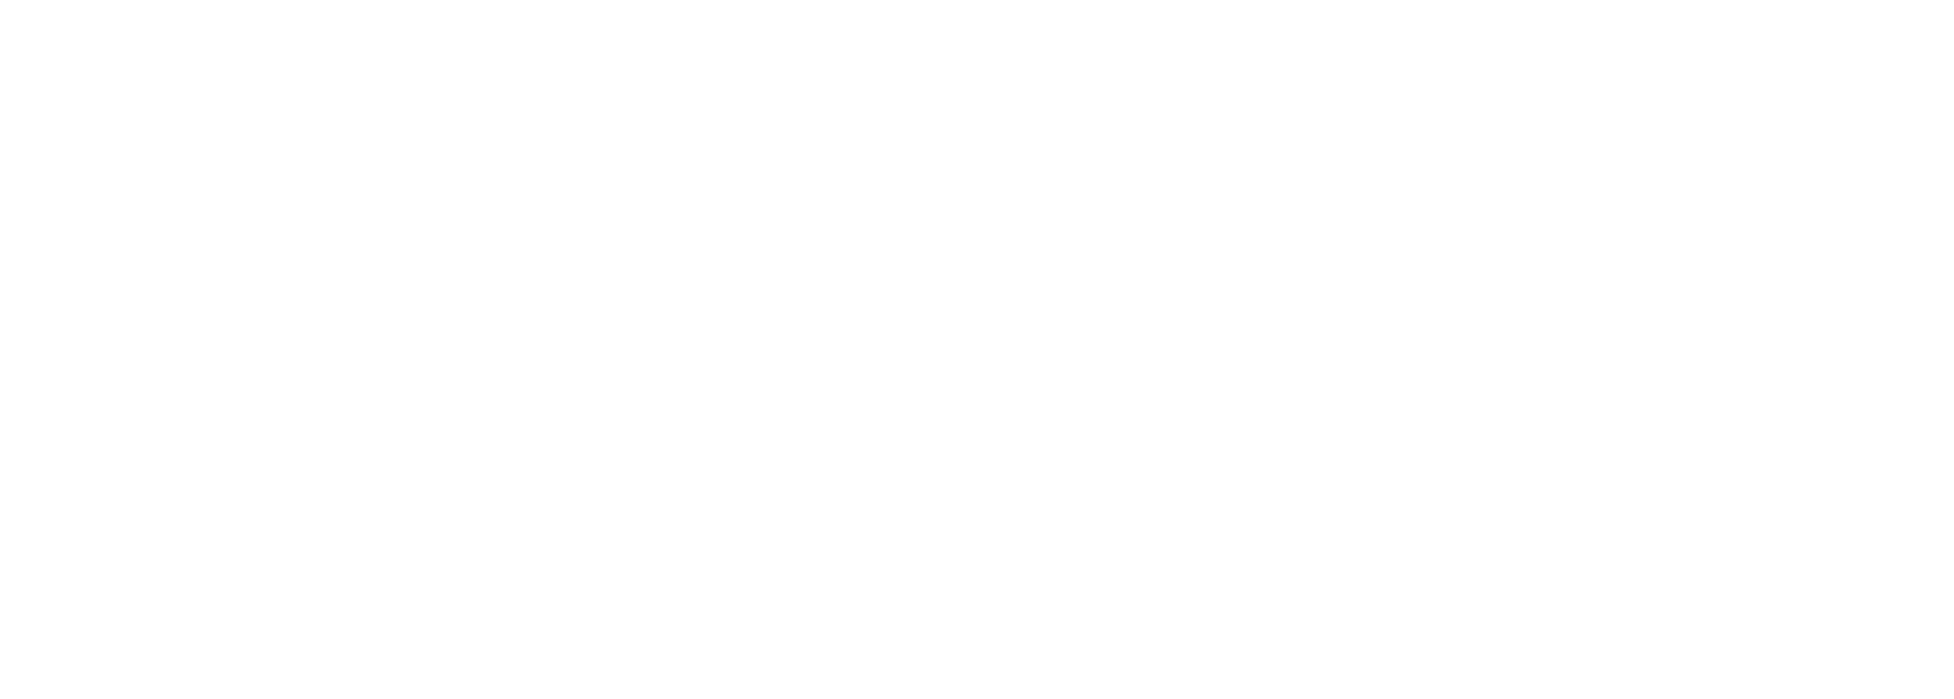 MOCEAN logo